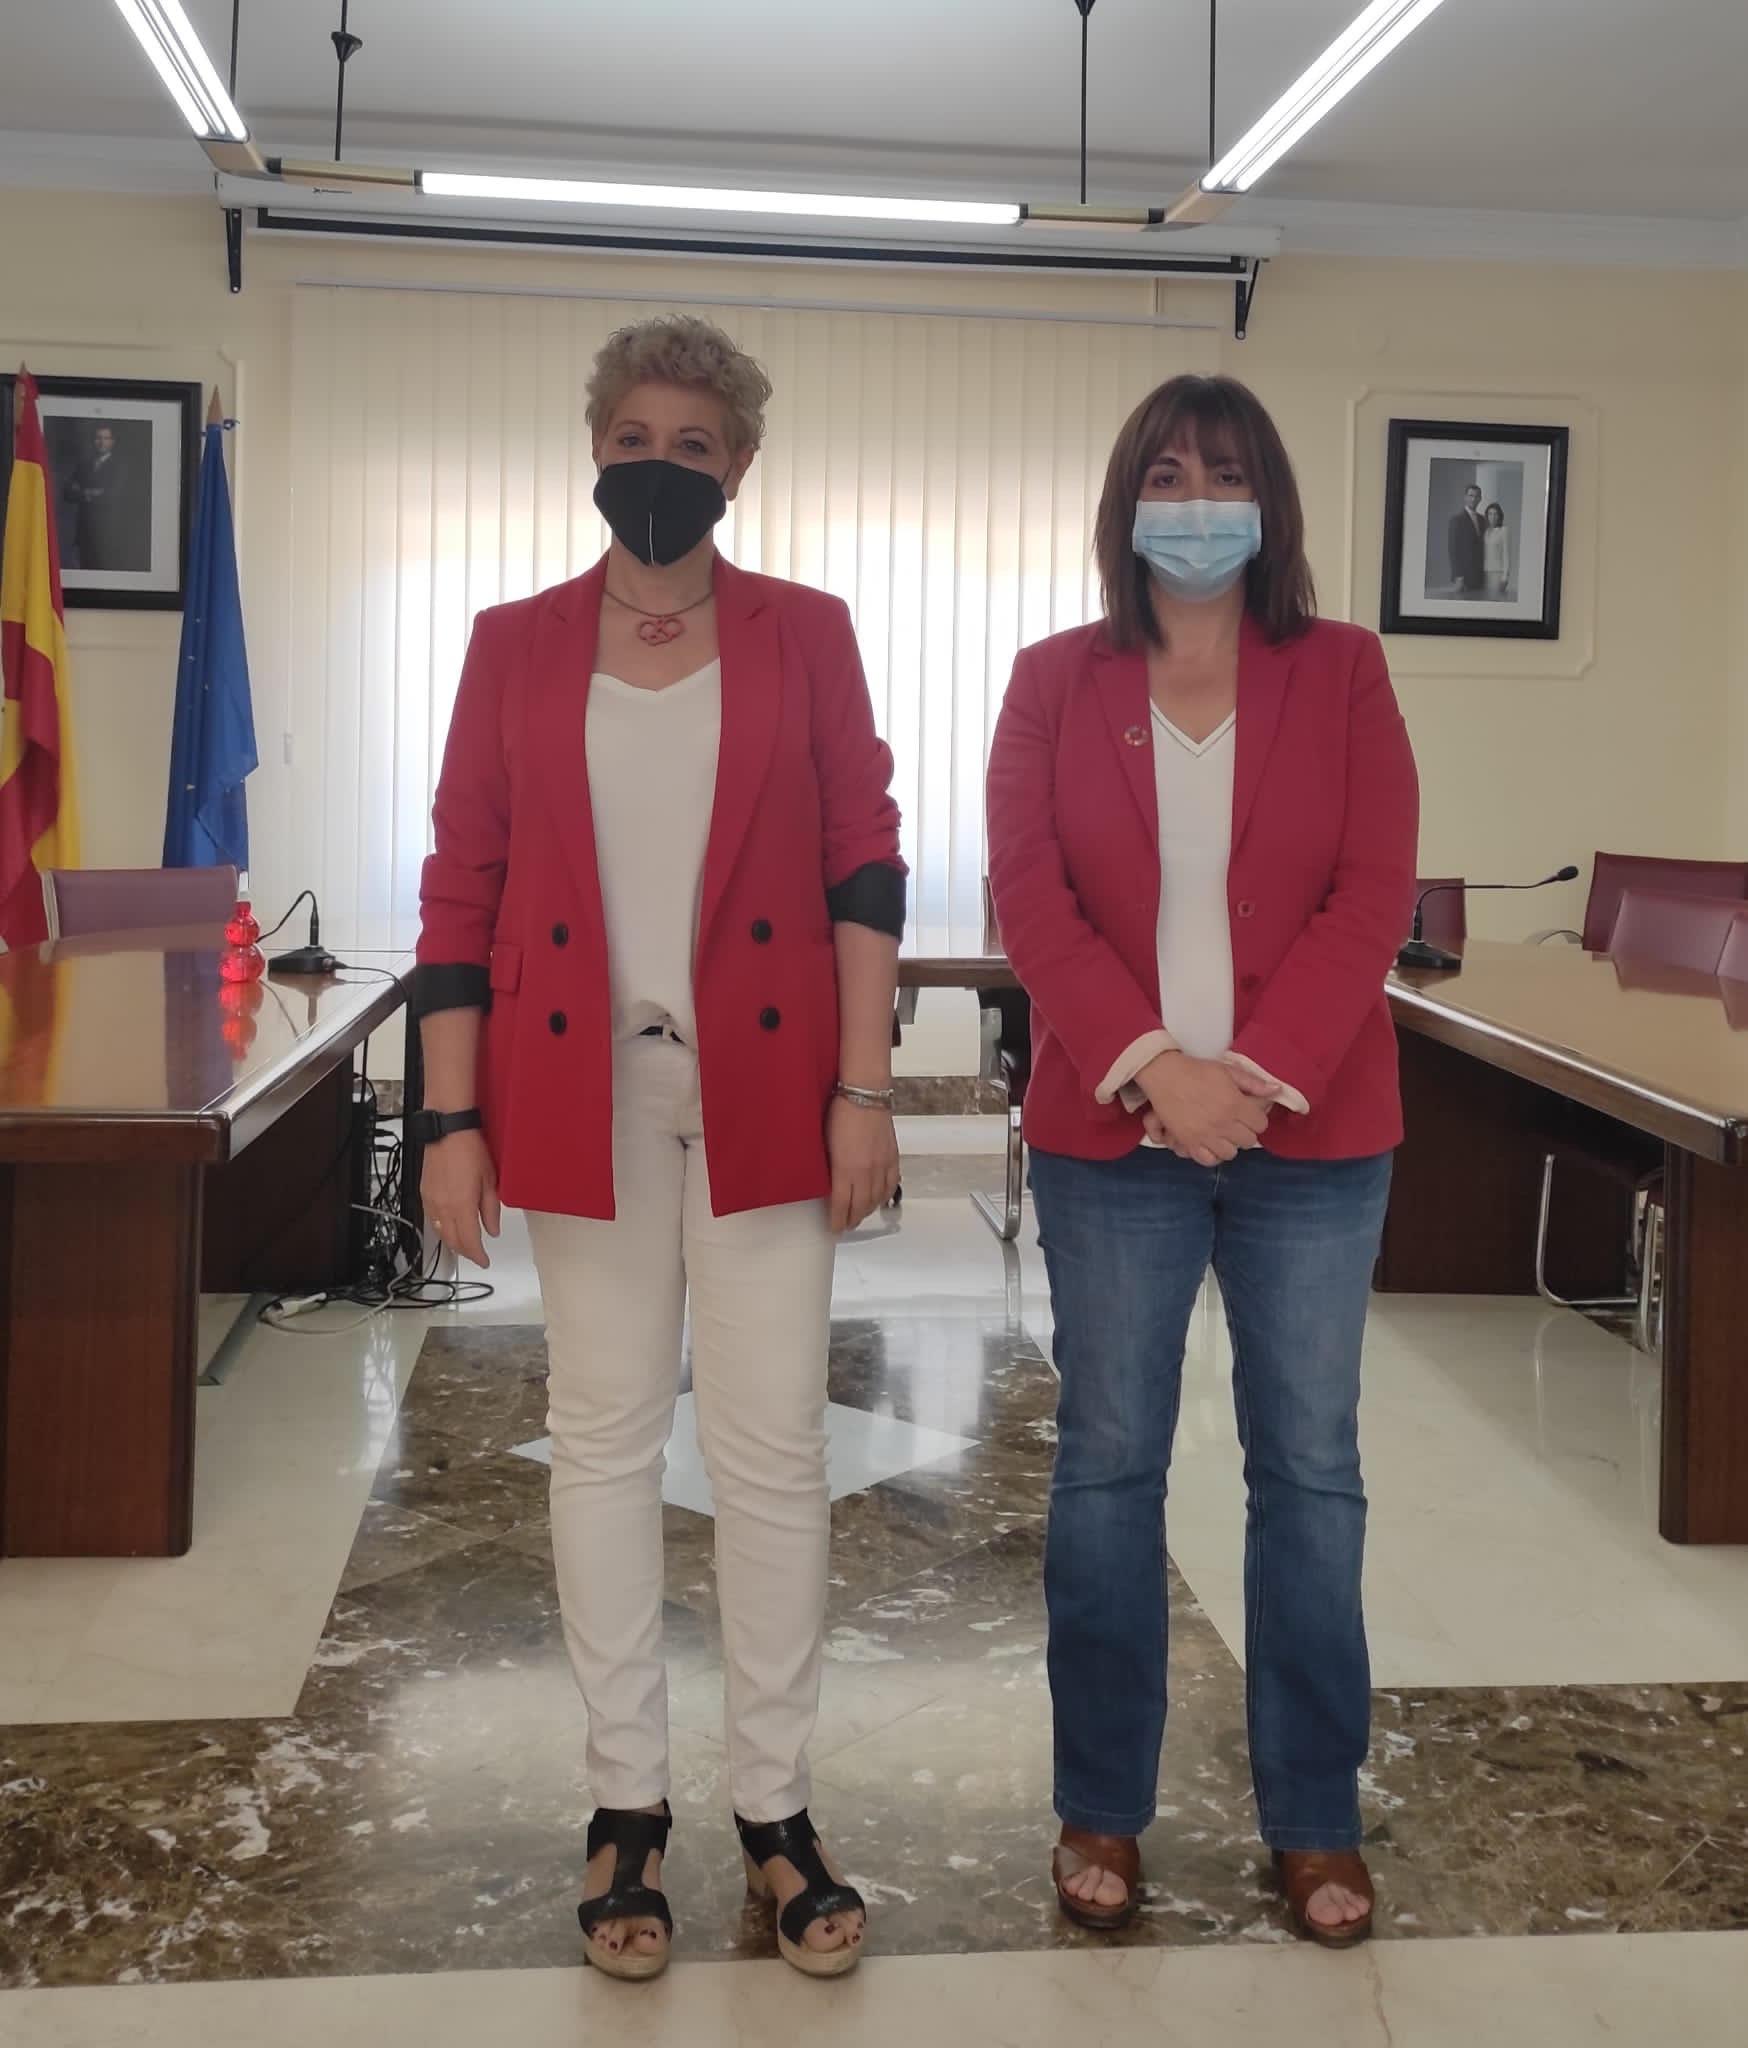 Diputación destina más de 47.000 euros a ayudas sociales para personas vulnerables en Chauchina